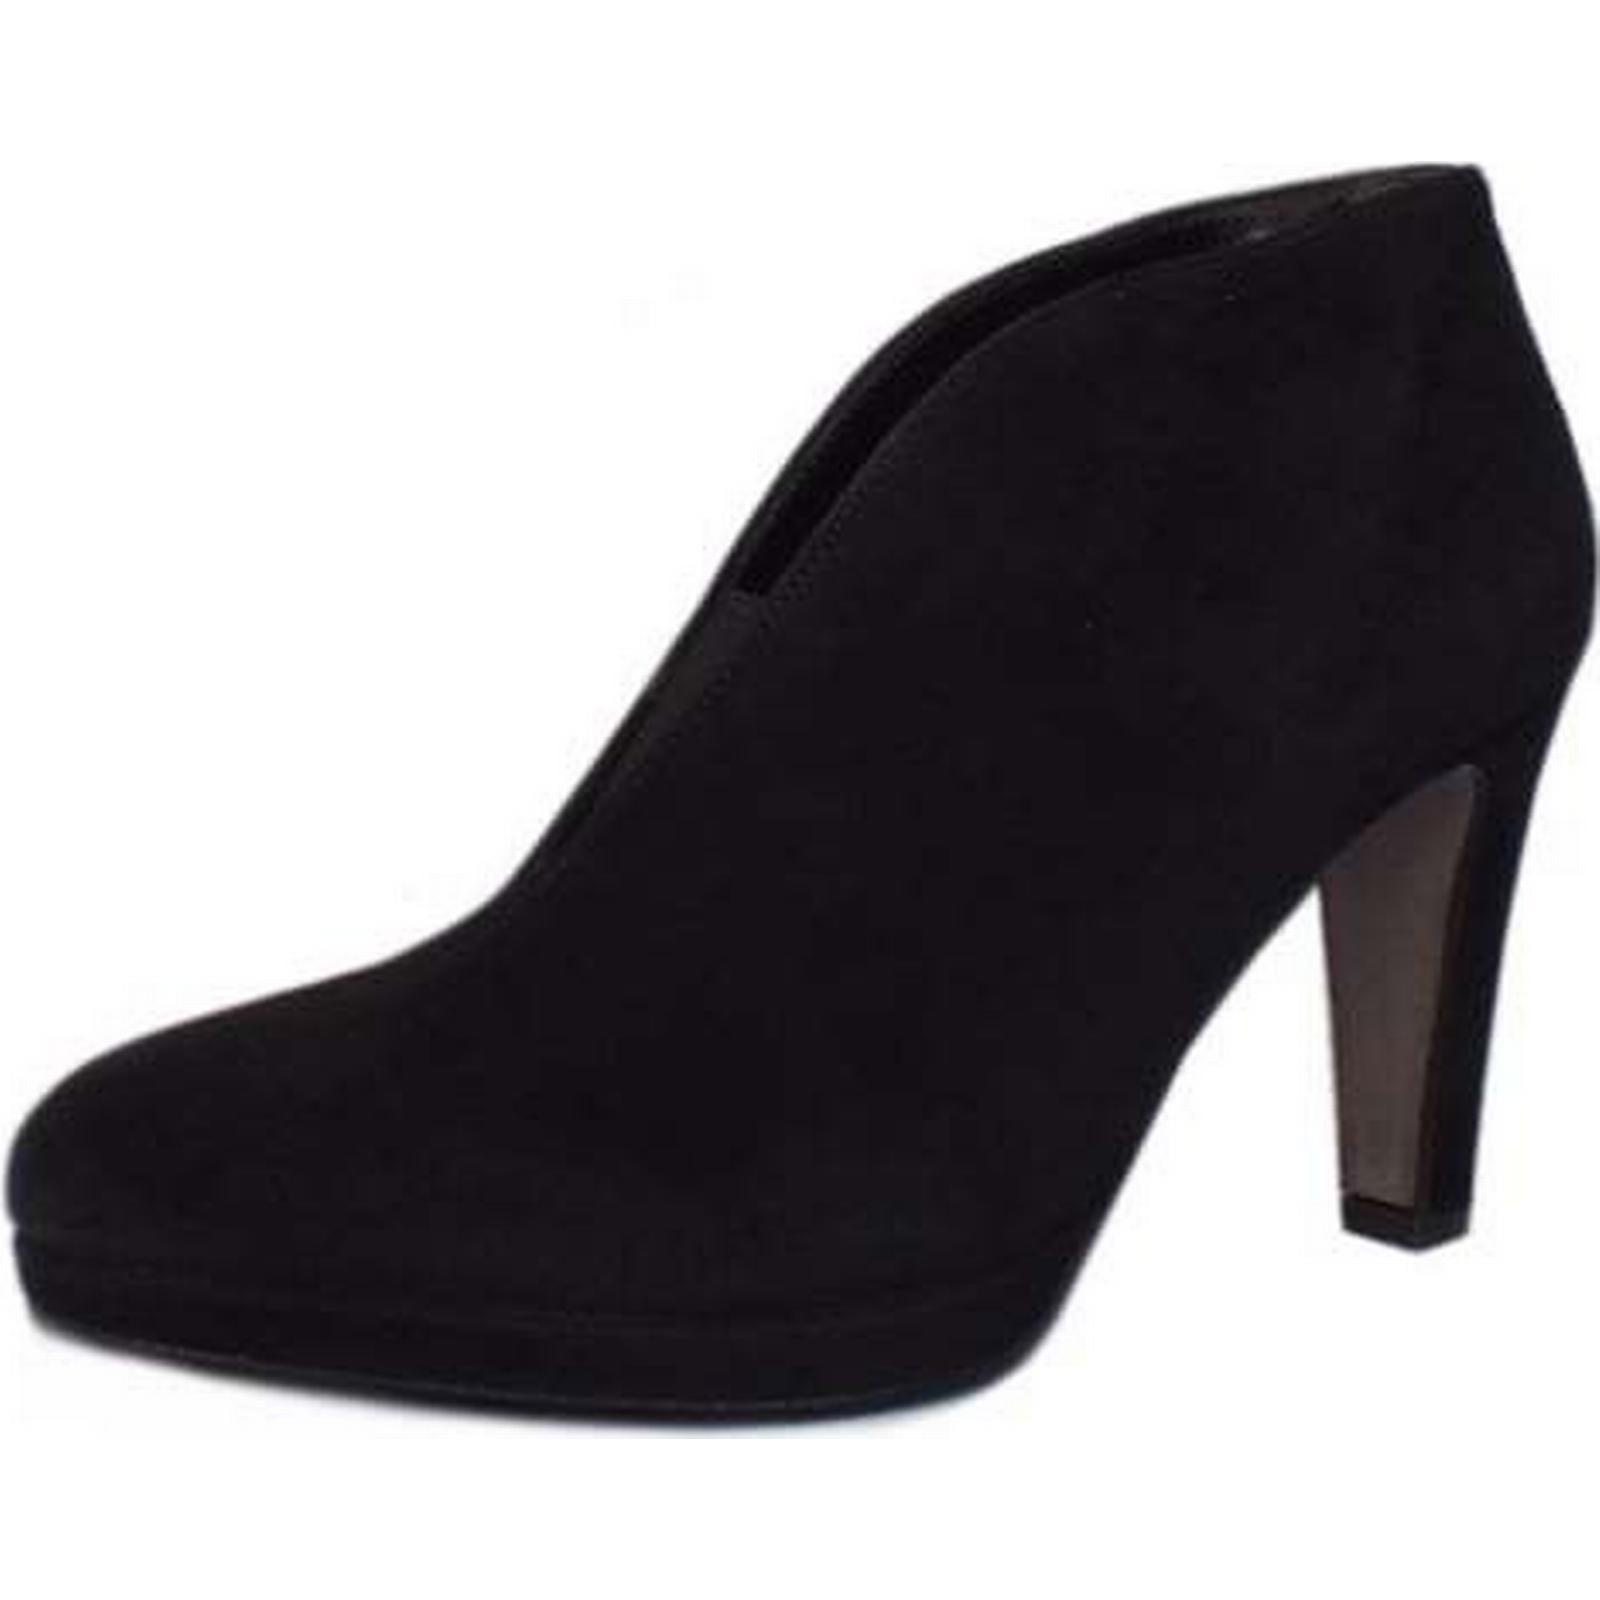 Gabor AMIEN GABOR LADIES ANKLE BOOTS Size: 4.5, 4.5, Size: Colour: BLACK SUED 2b53f6